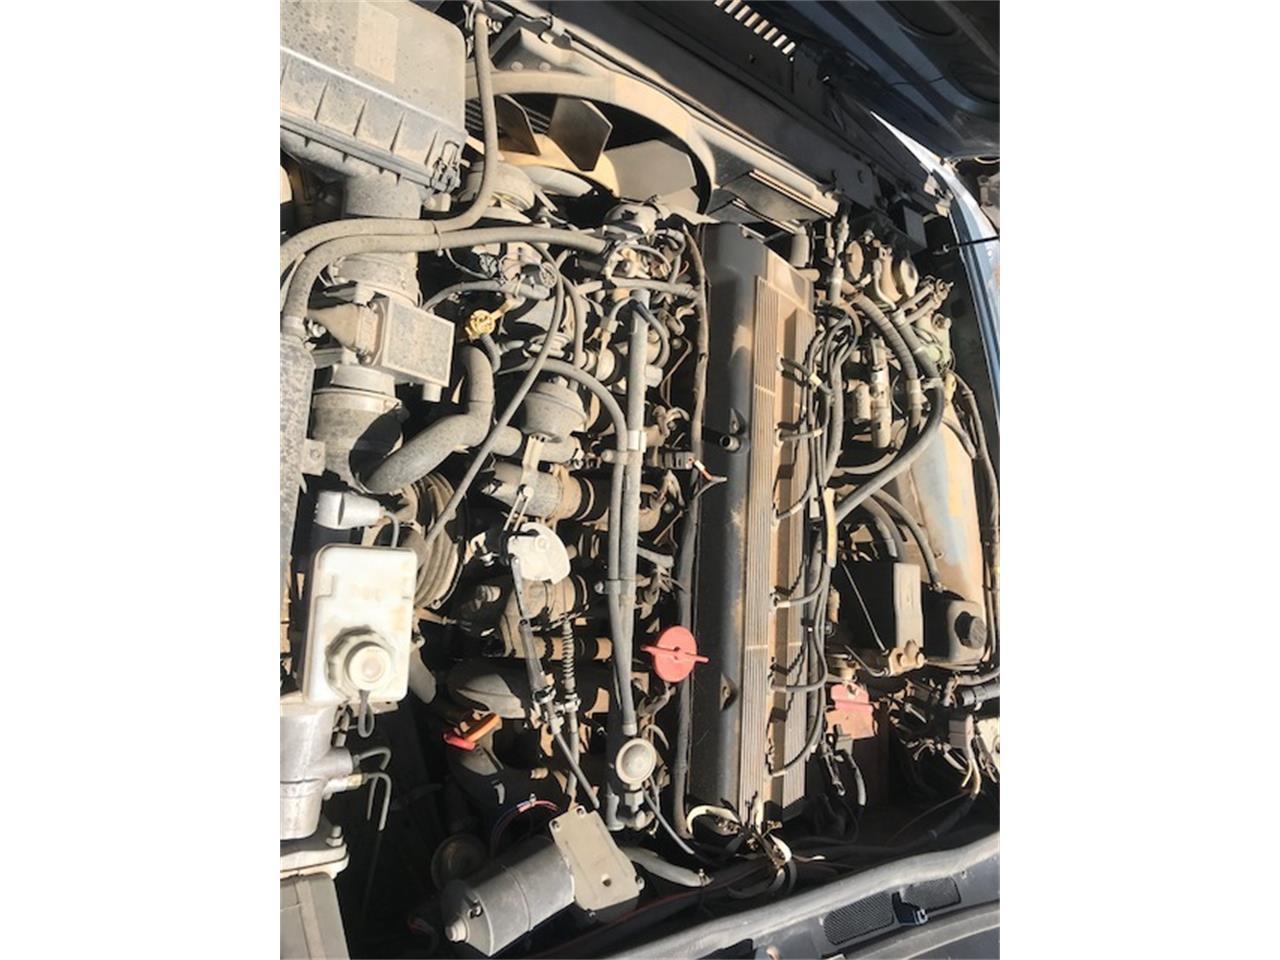 1988 Jaguar 4-Dr Sedan (CC-1114013) for sale in Phoenix, Arizona